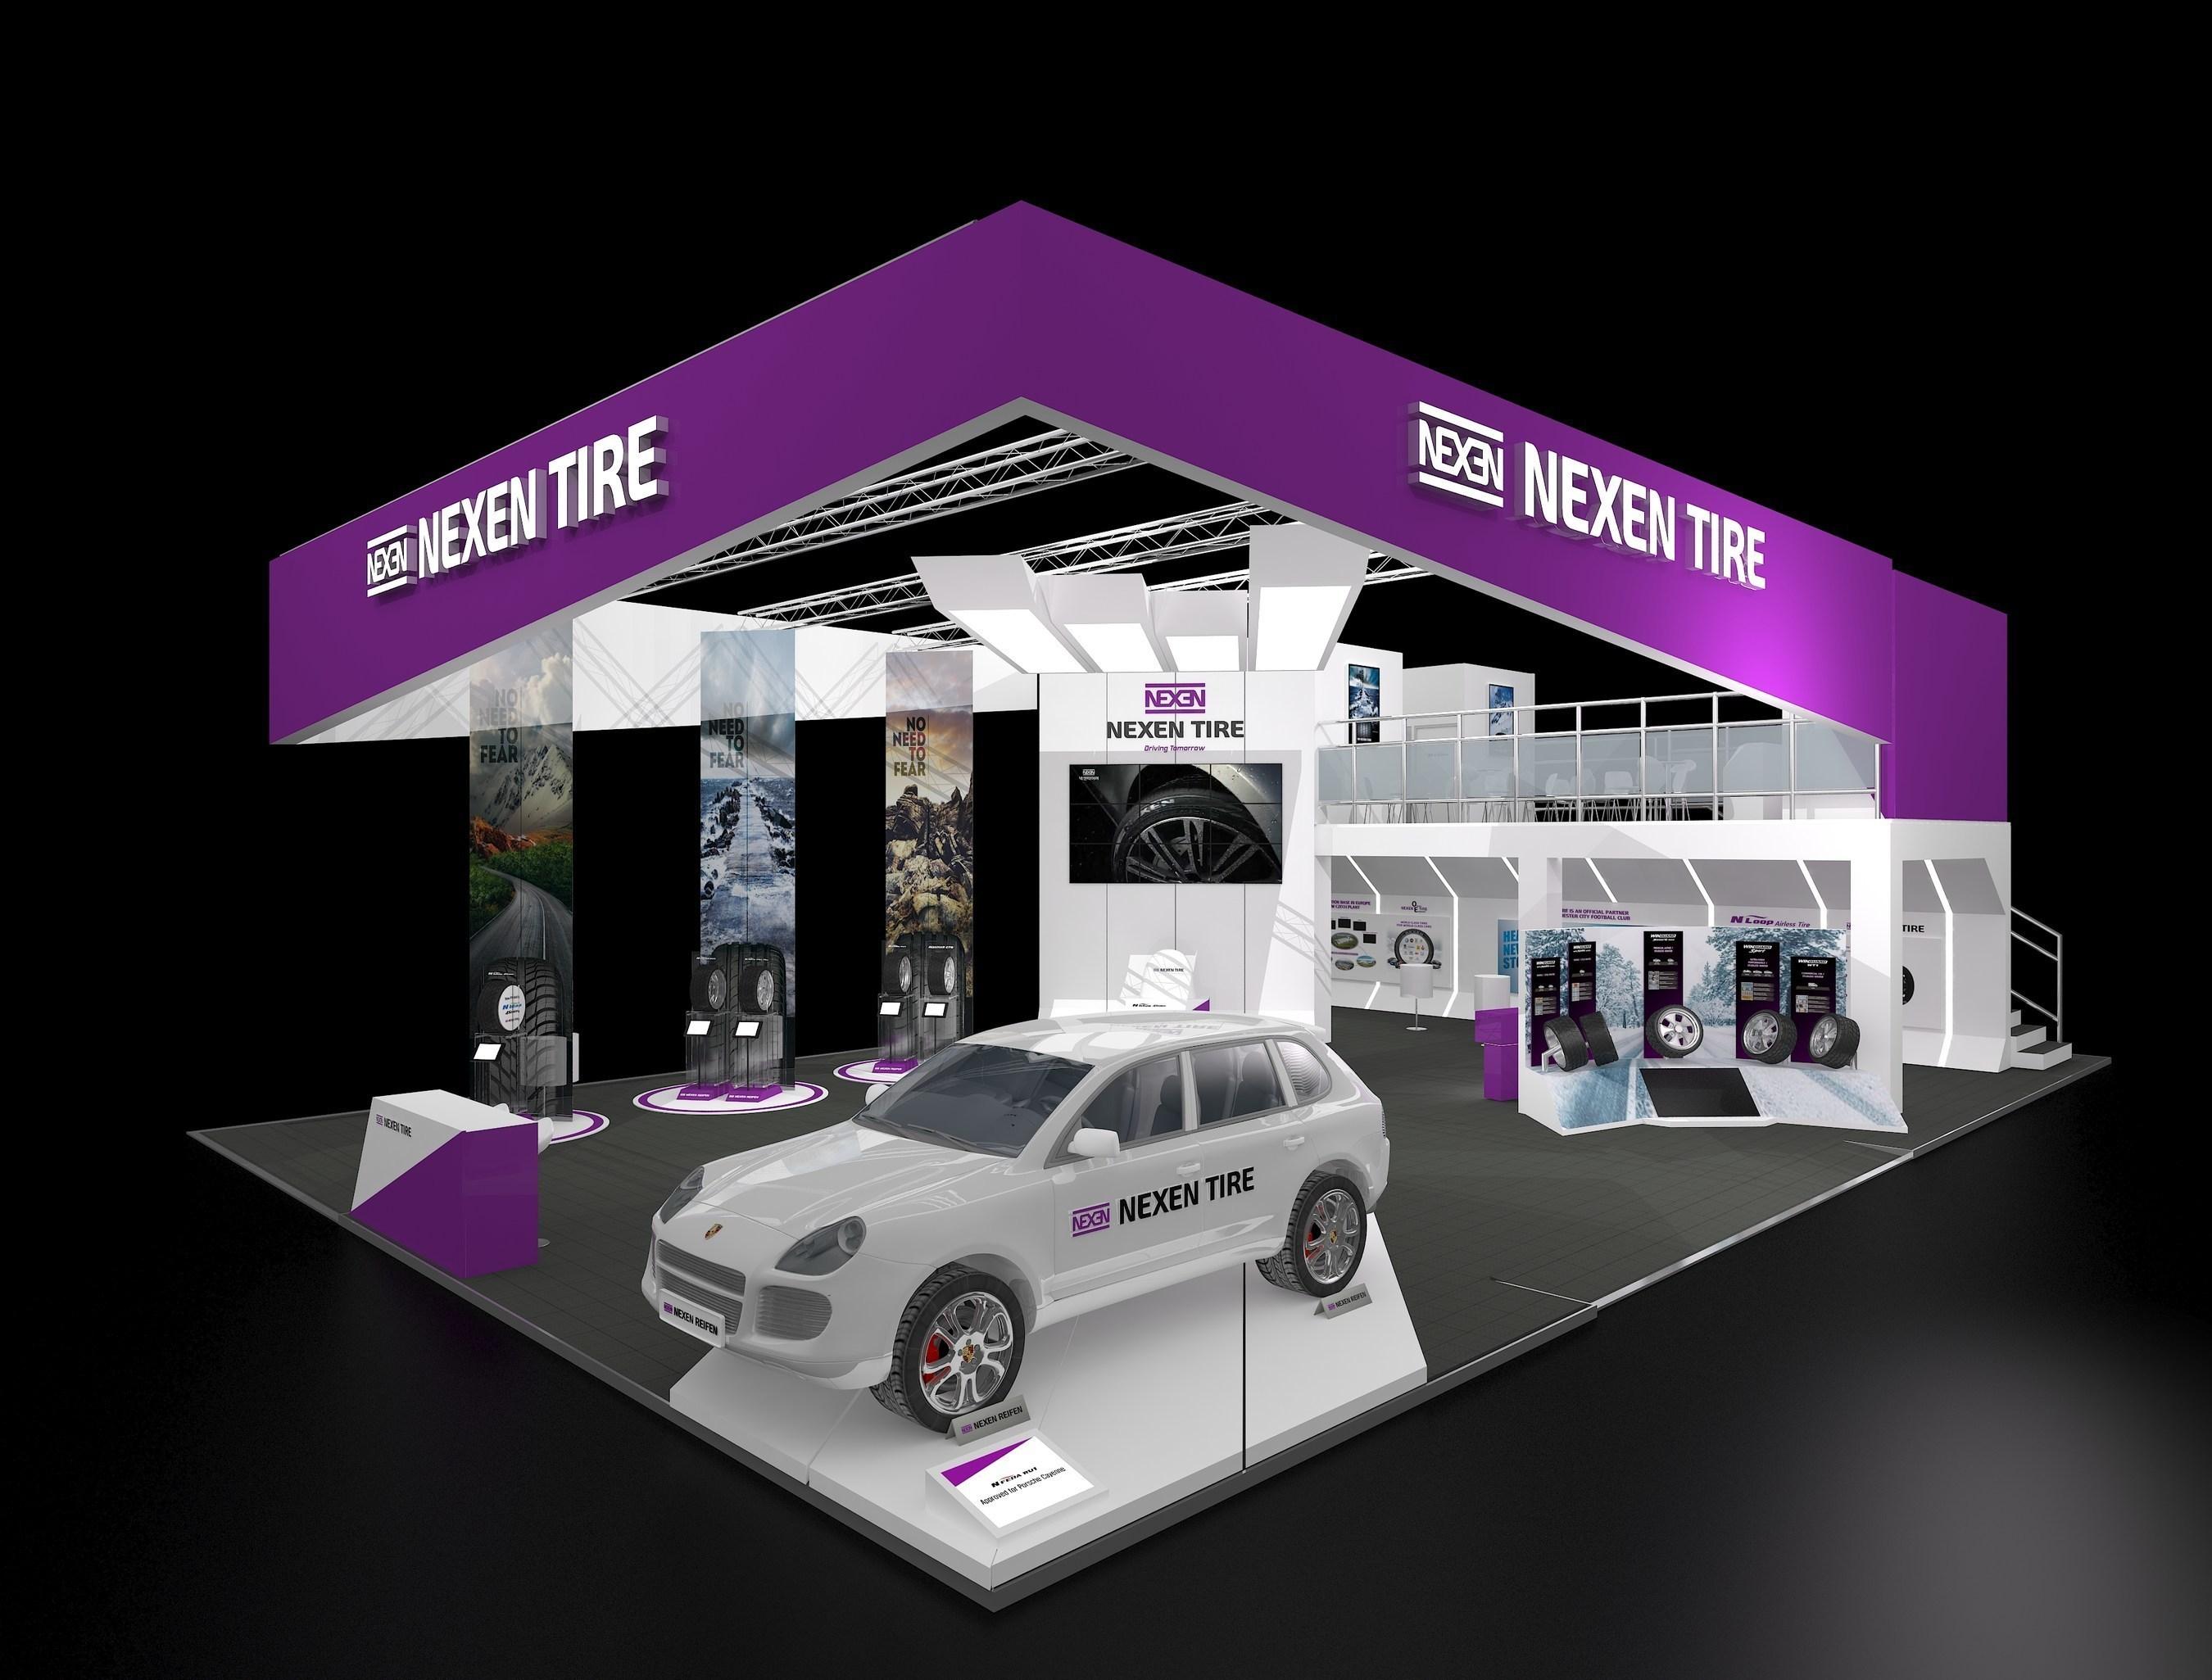 Nexen Tire Announces Participation in REIFEN 2016 in Germany